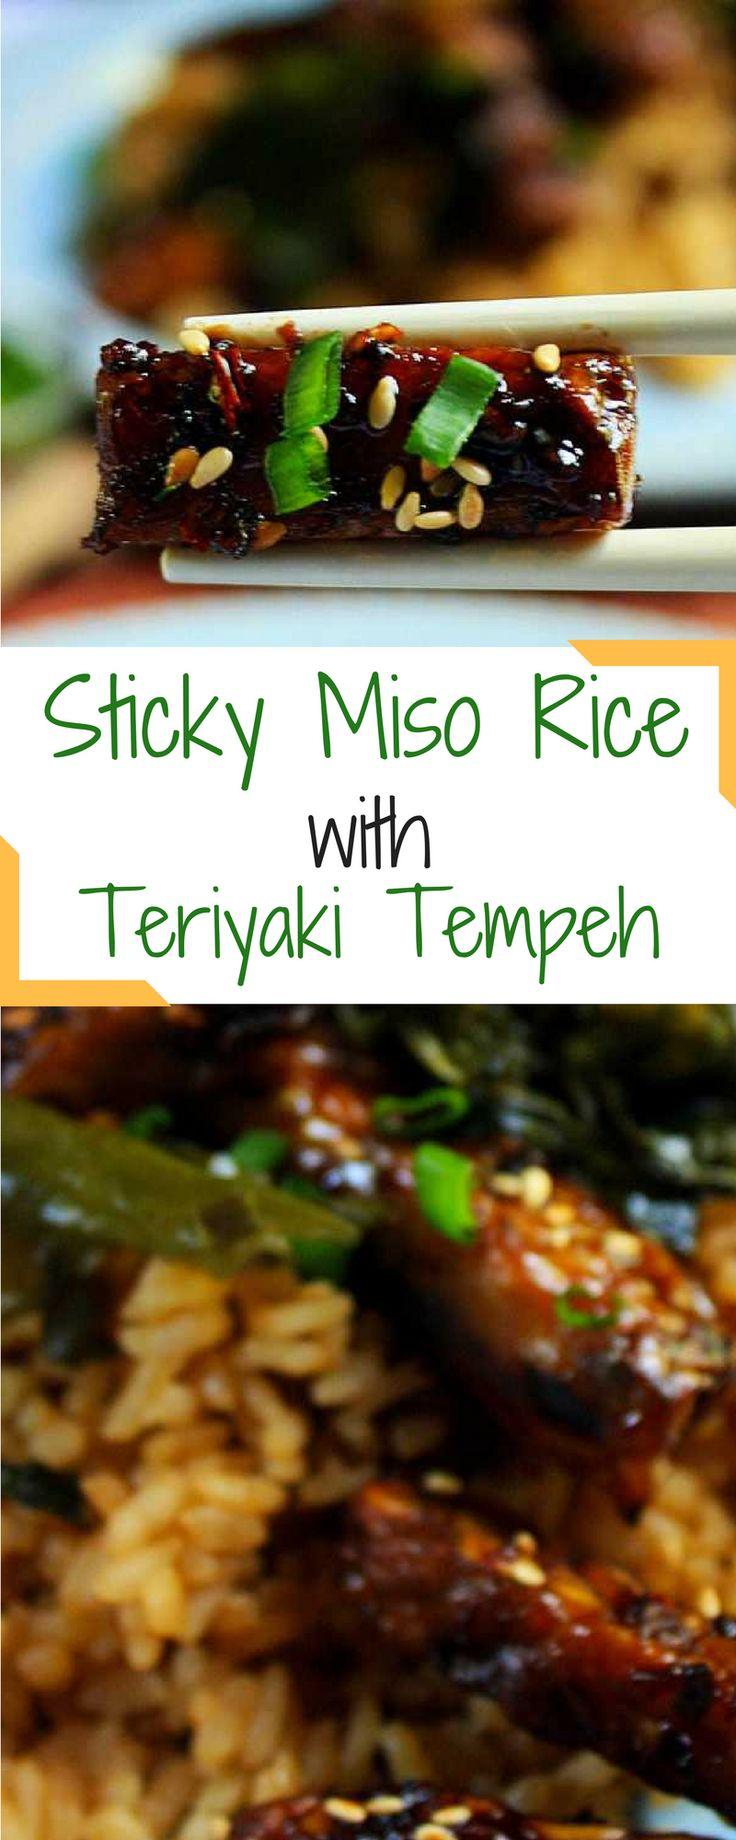 Sticky Miso Rice with Teriyaki Tempeh | Vegan.io | The easist way to follow a vegan diet